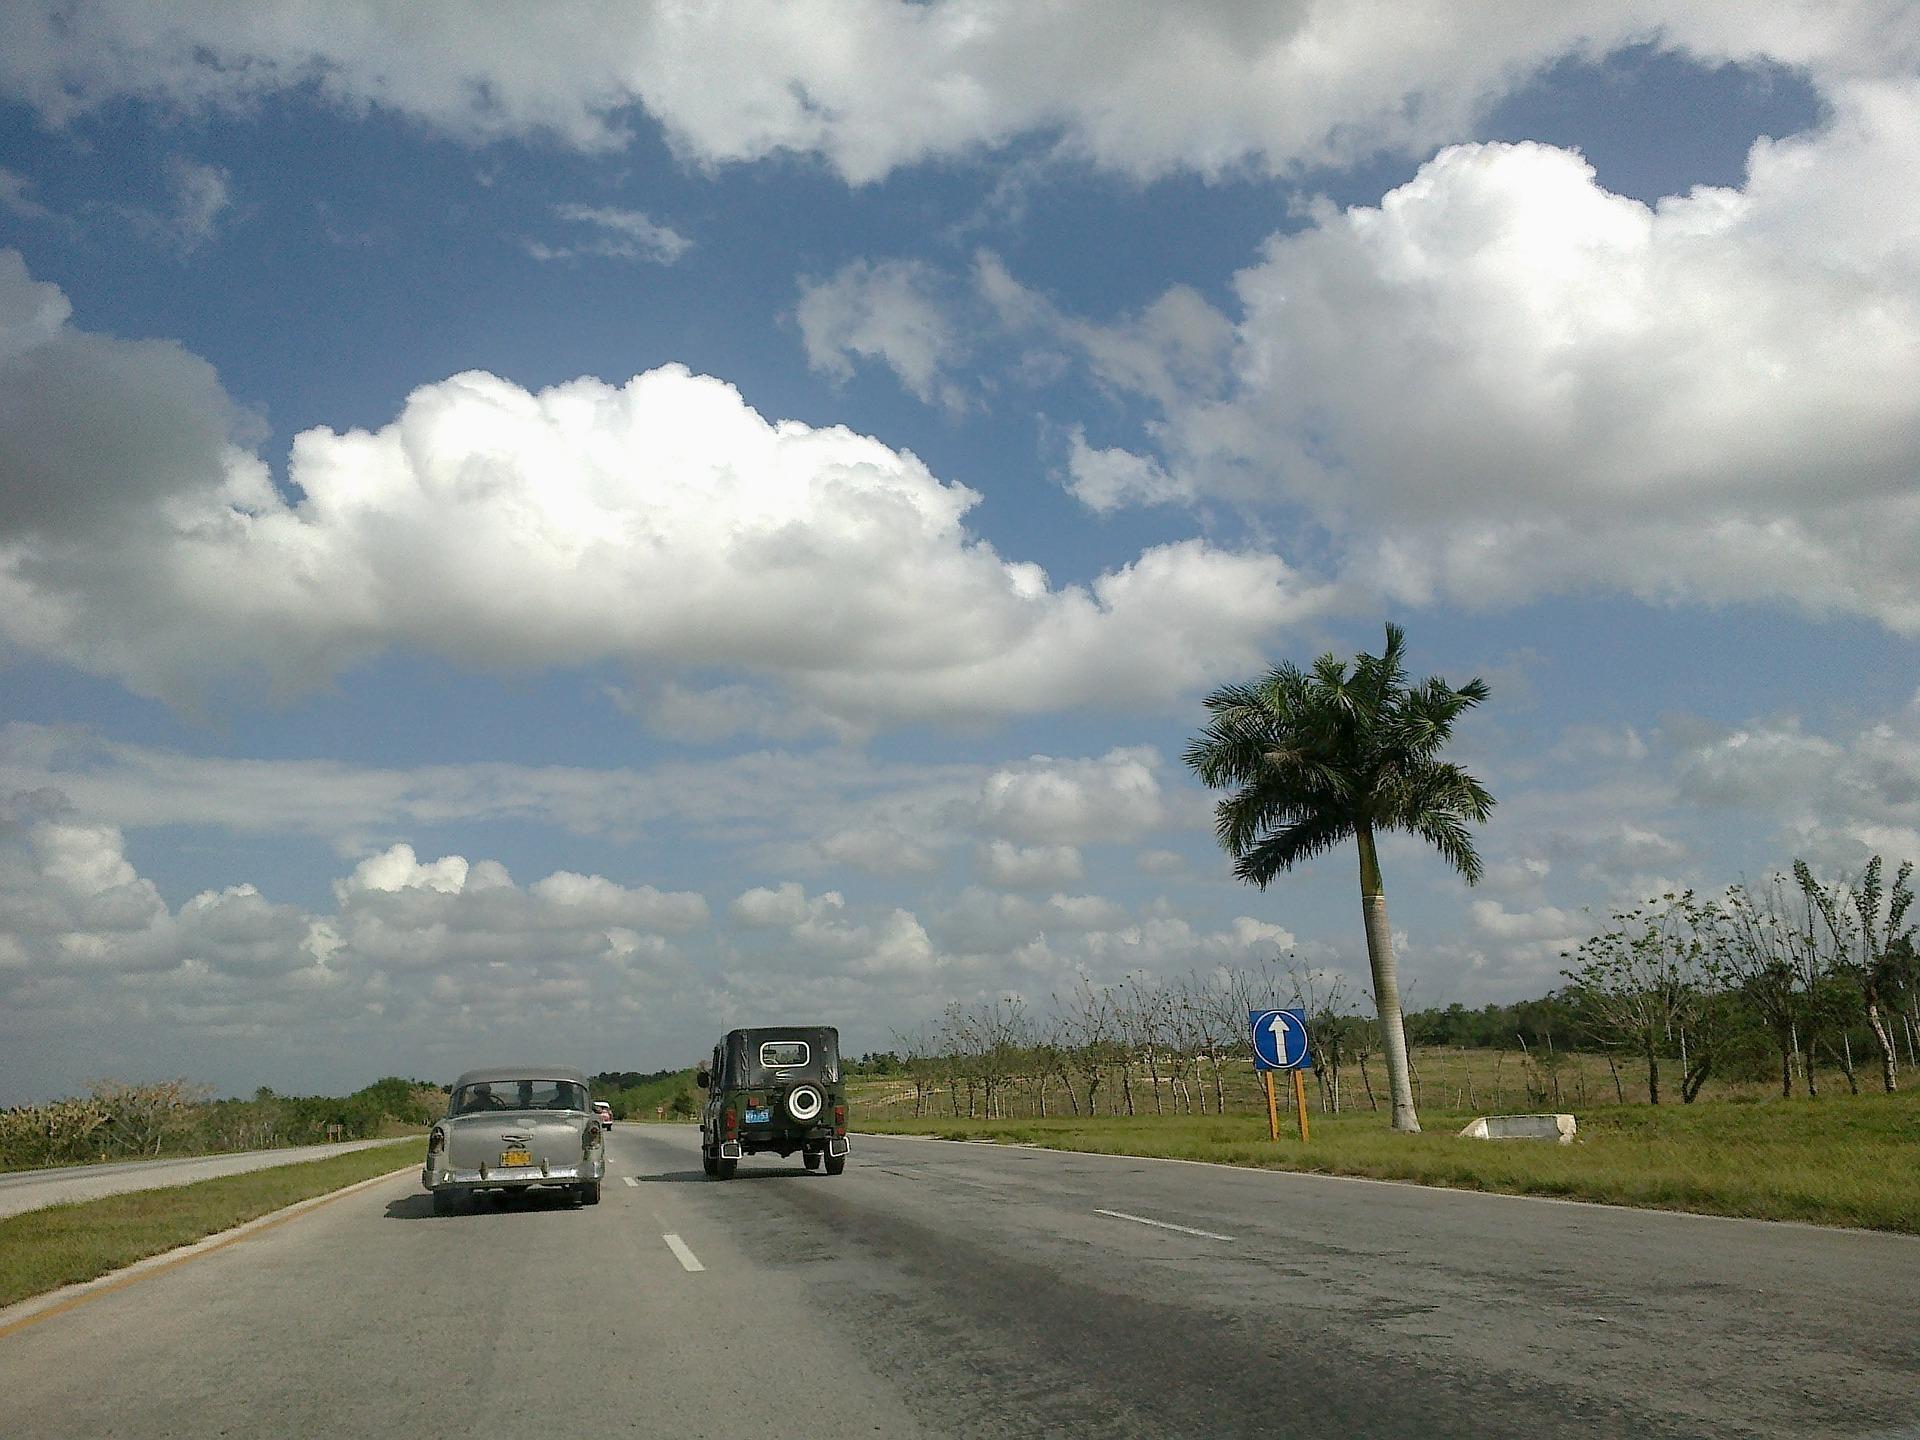 Driving down the beach road in Cuba